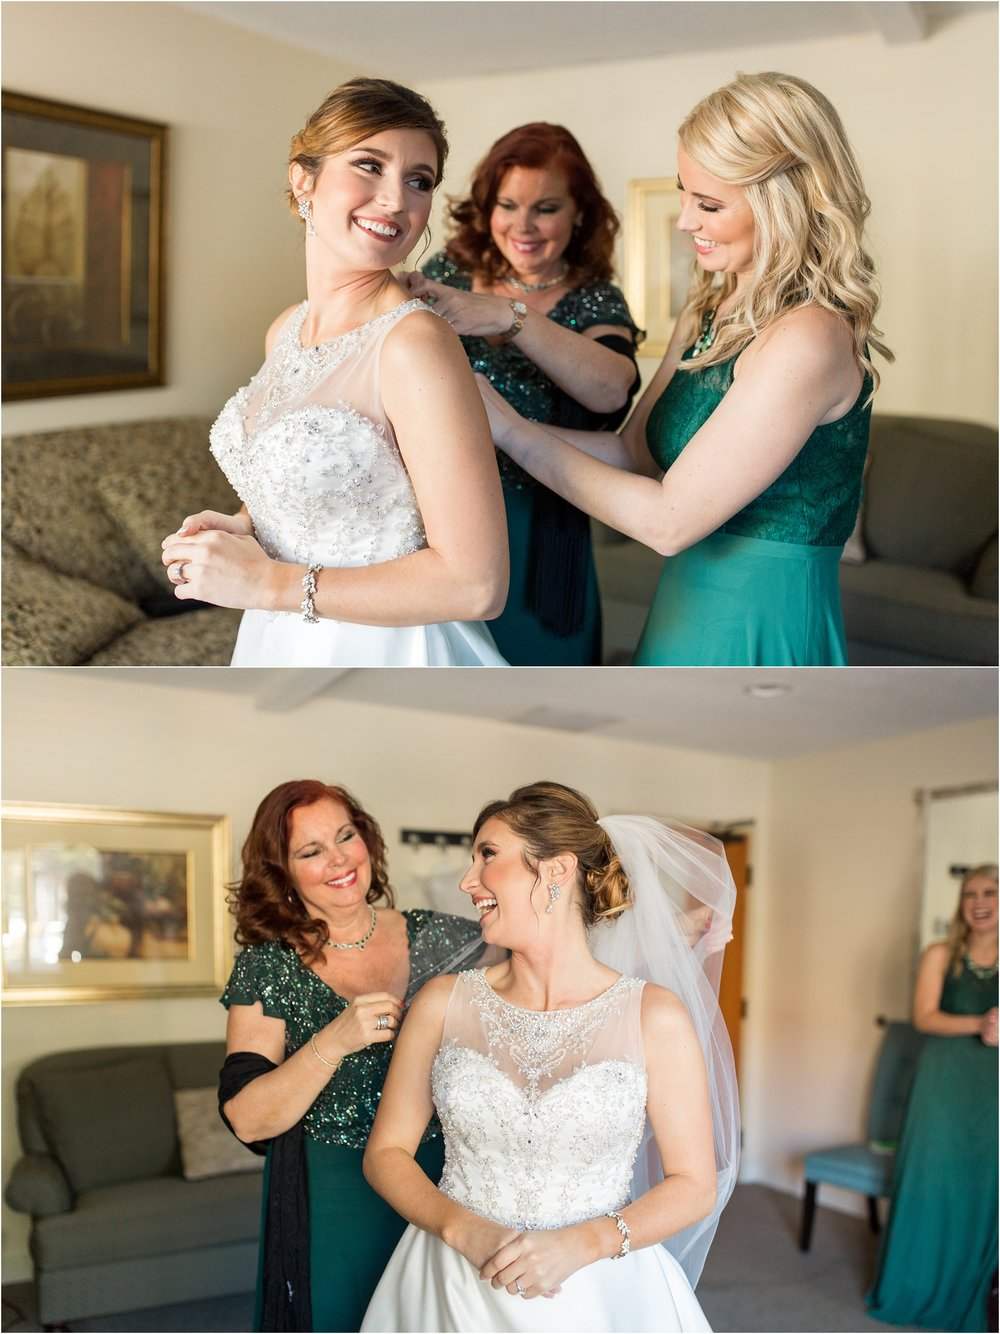 Savannah Eve Photography- Bottiglion-Scope Wedding- Sneak Peek-10.jpg